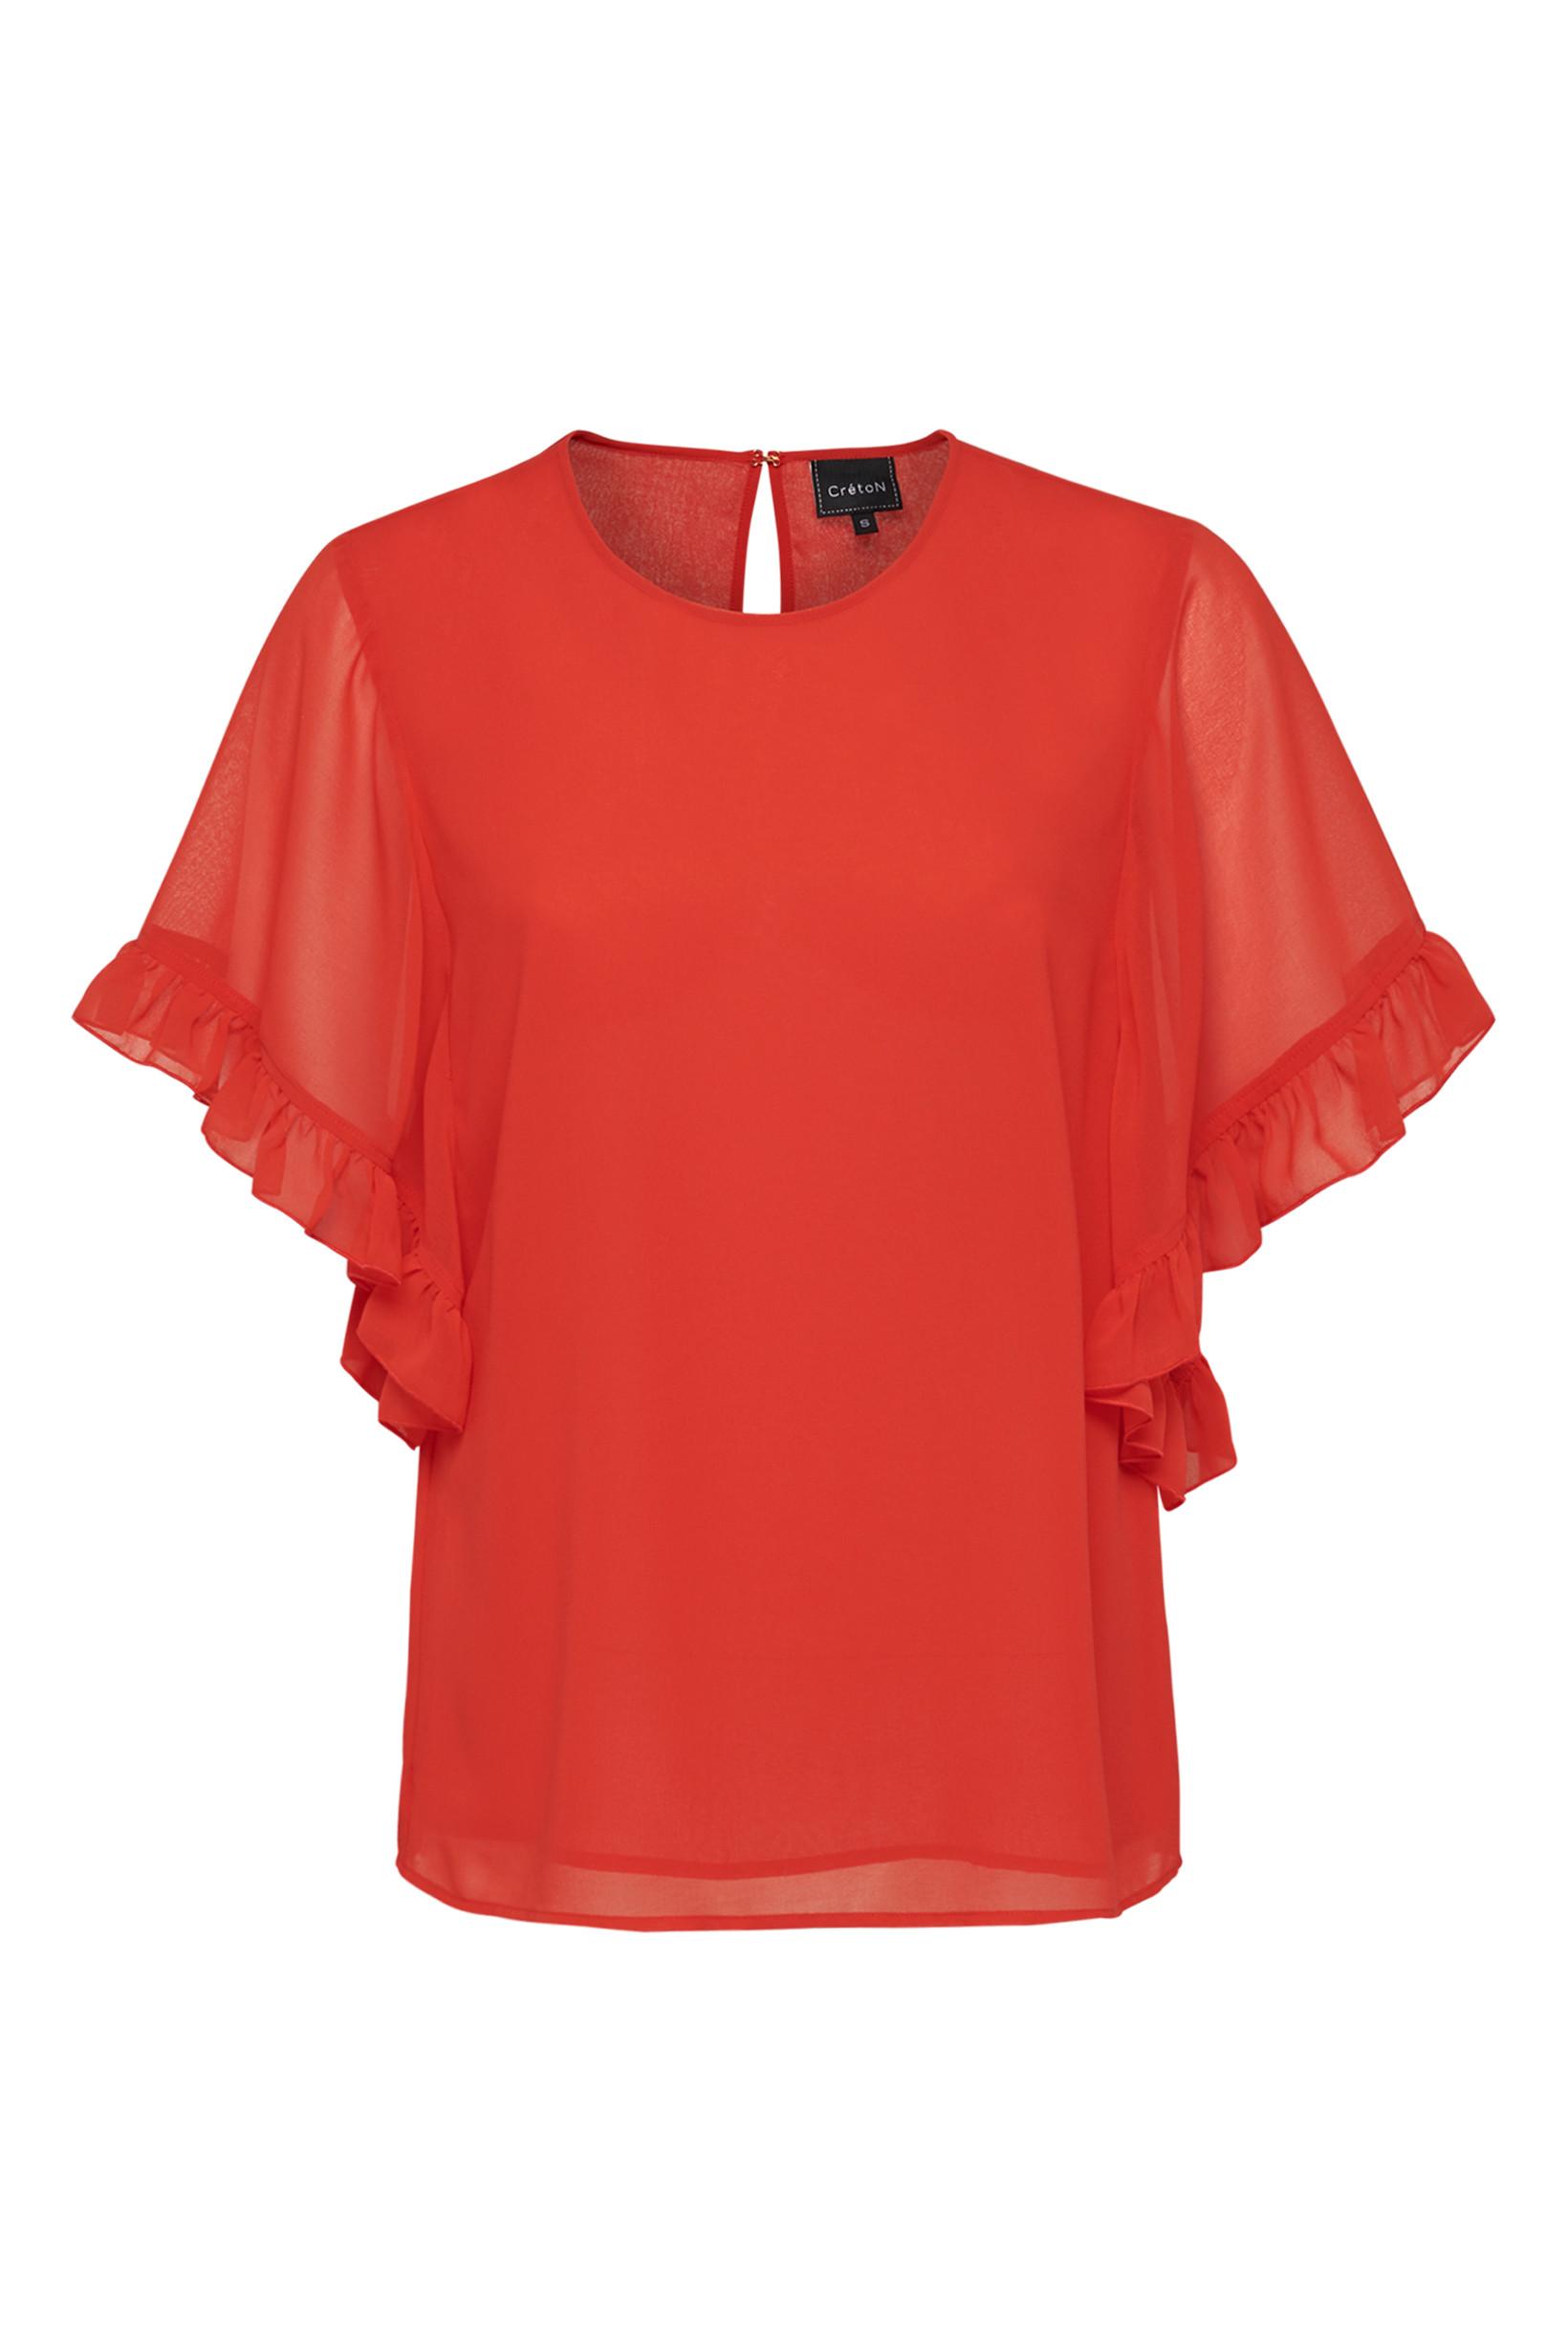 ee864633 CRÉTON Ruffle bluse » Køb den her